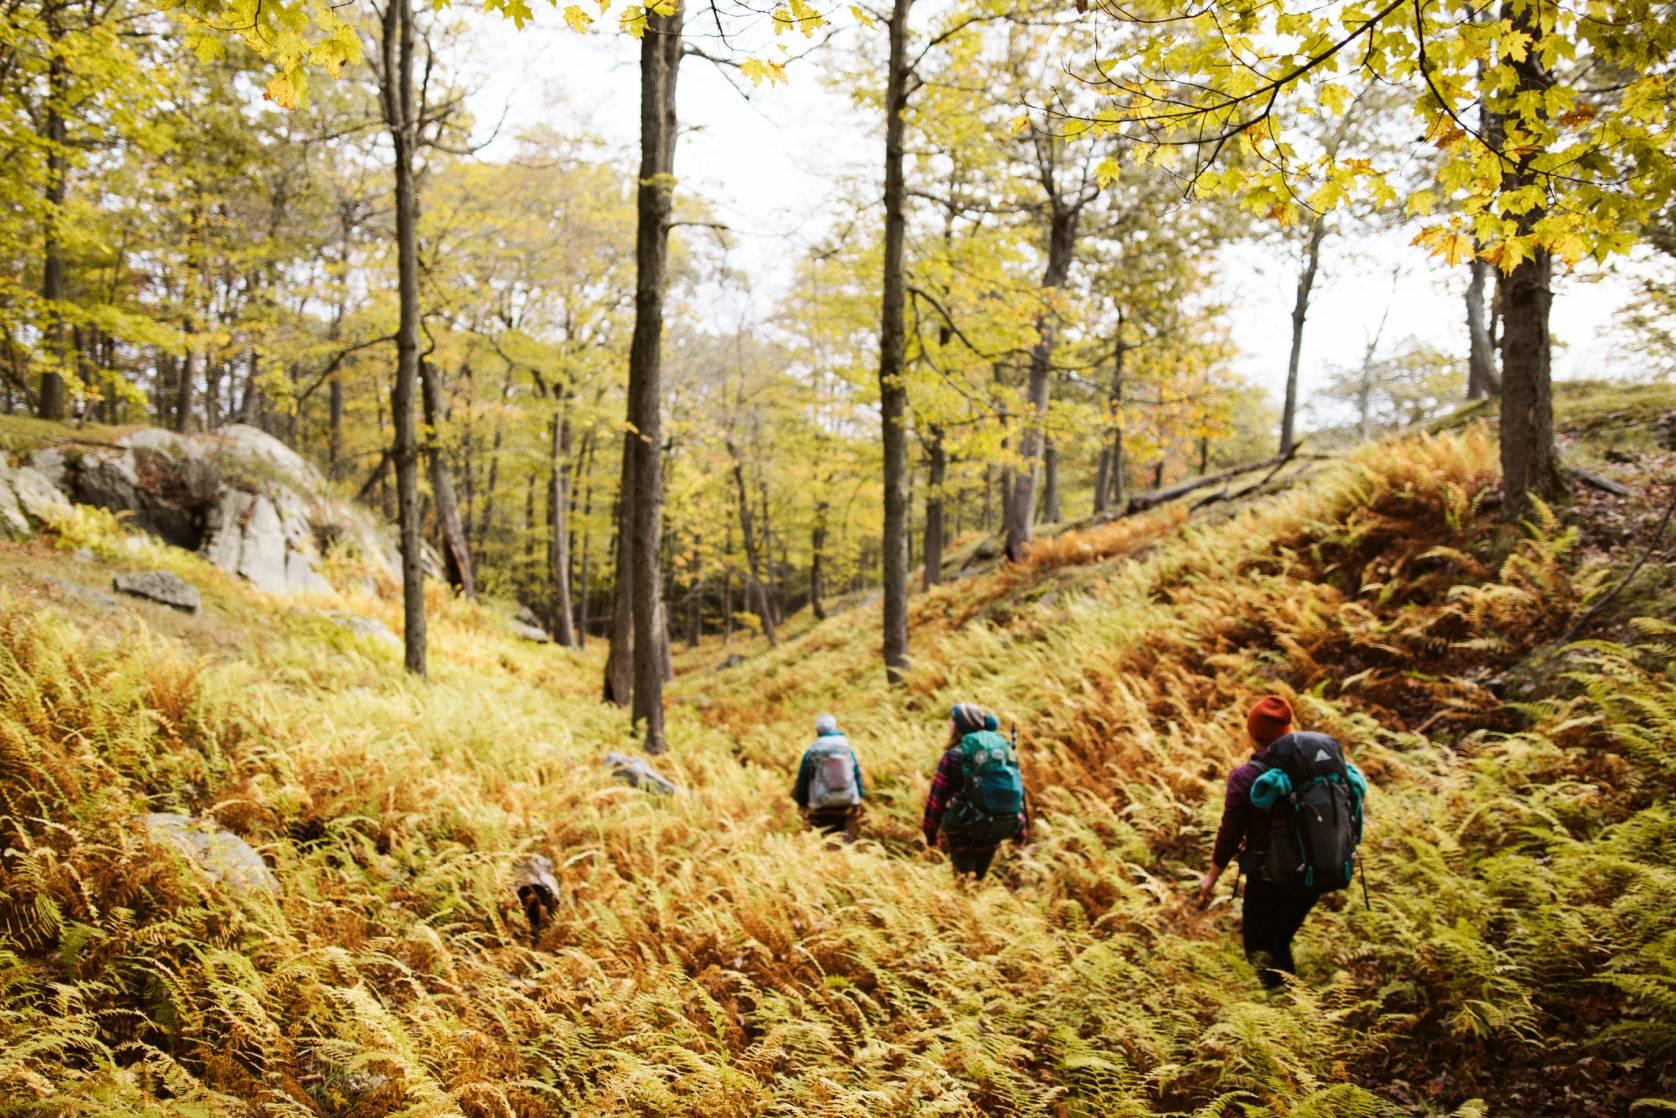 Hikers walking on trail